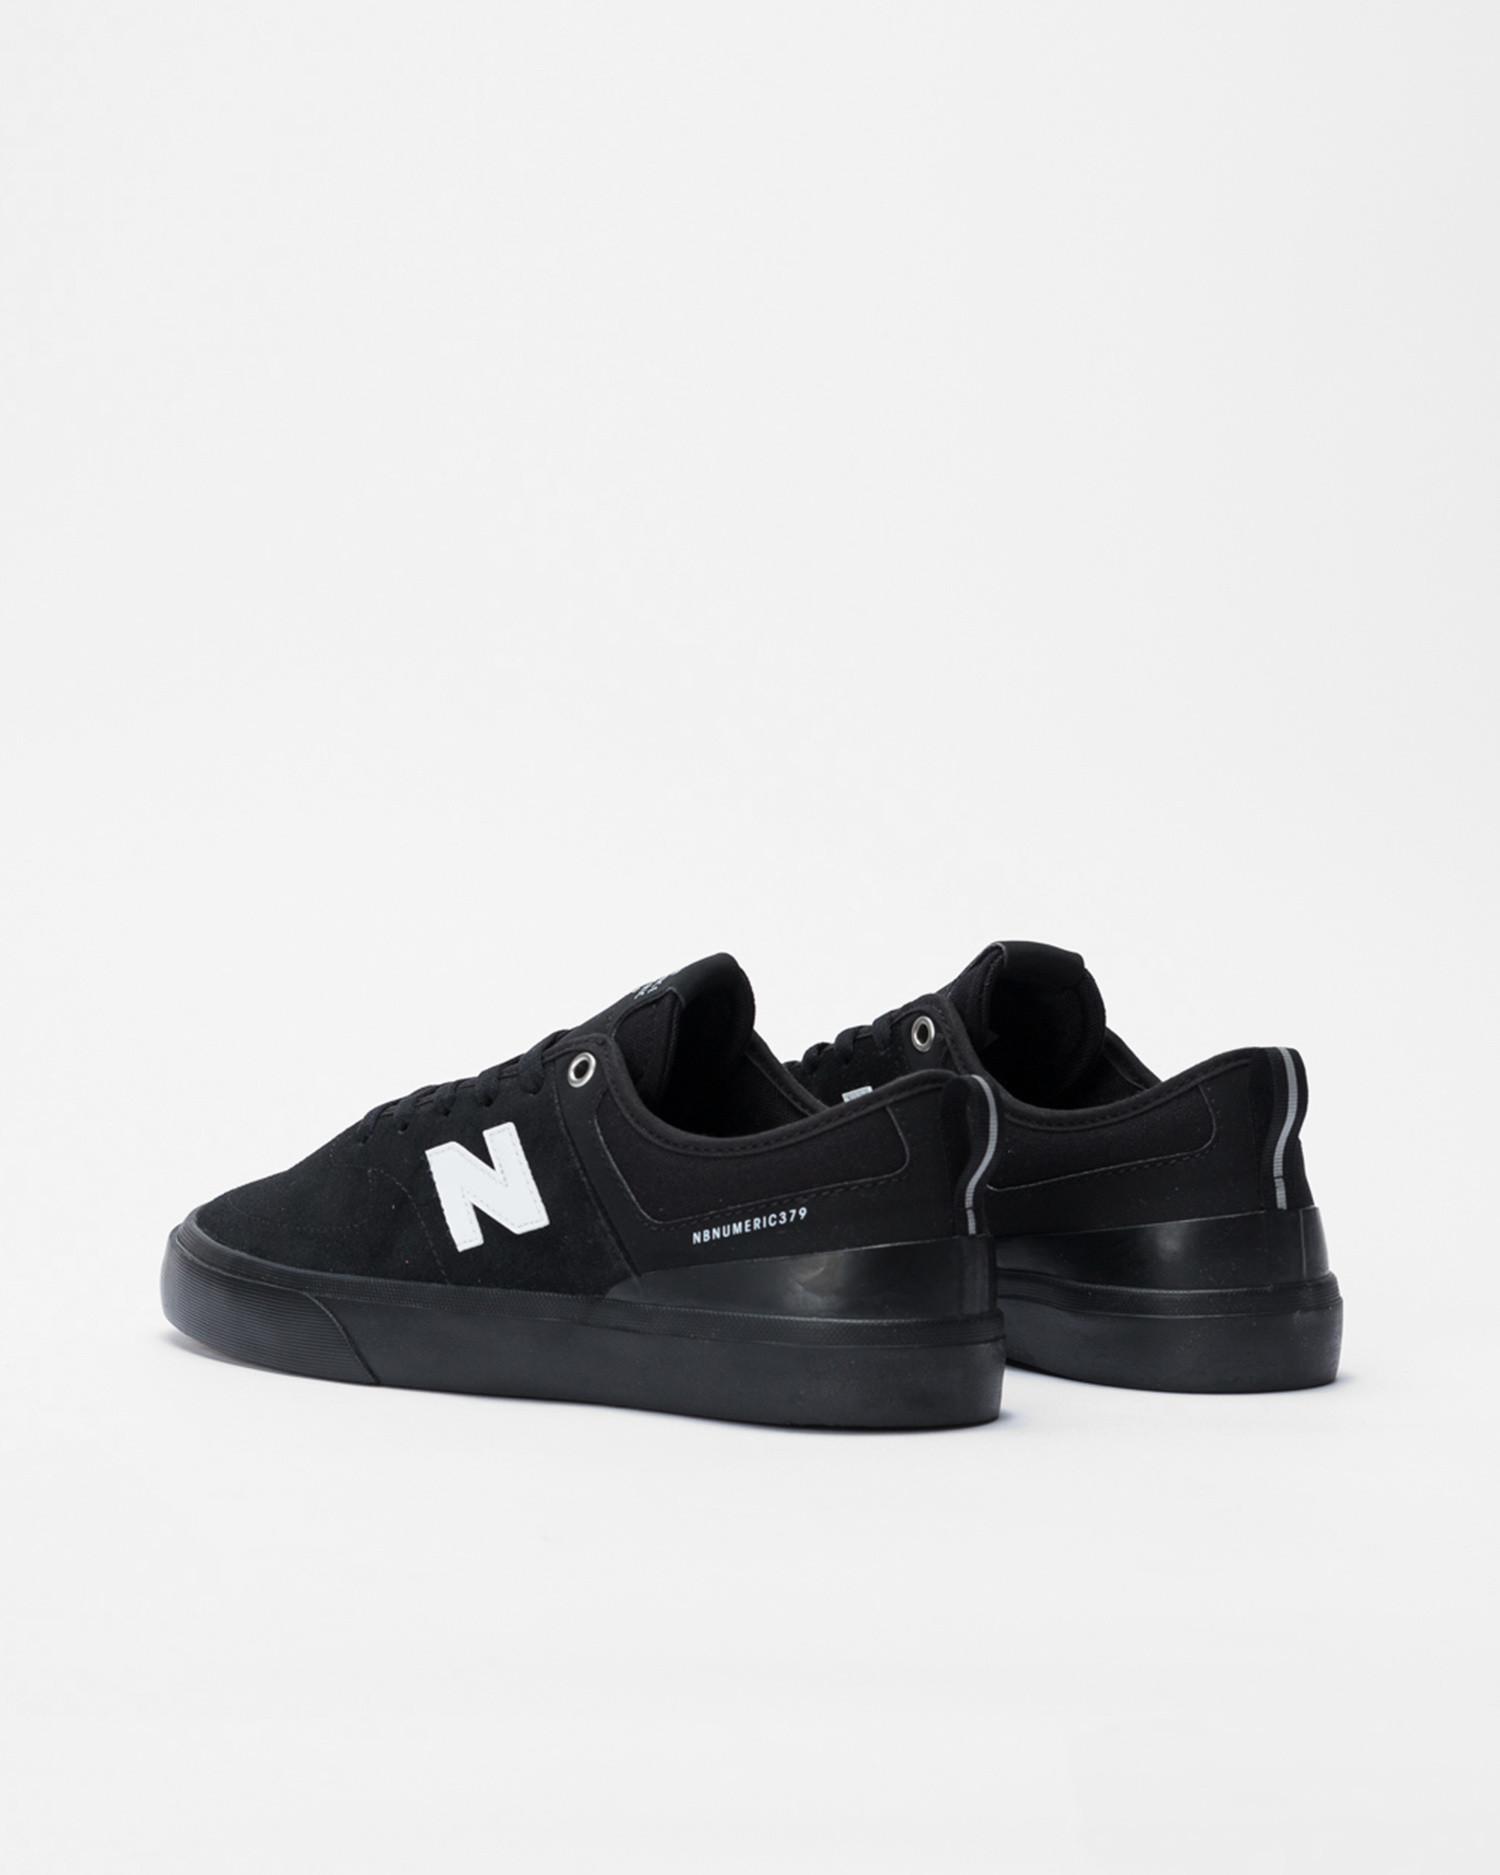 New Balance Numeric NM379D Das Black